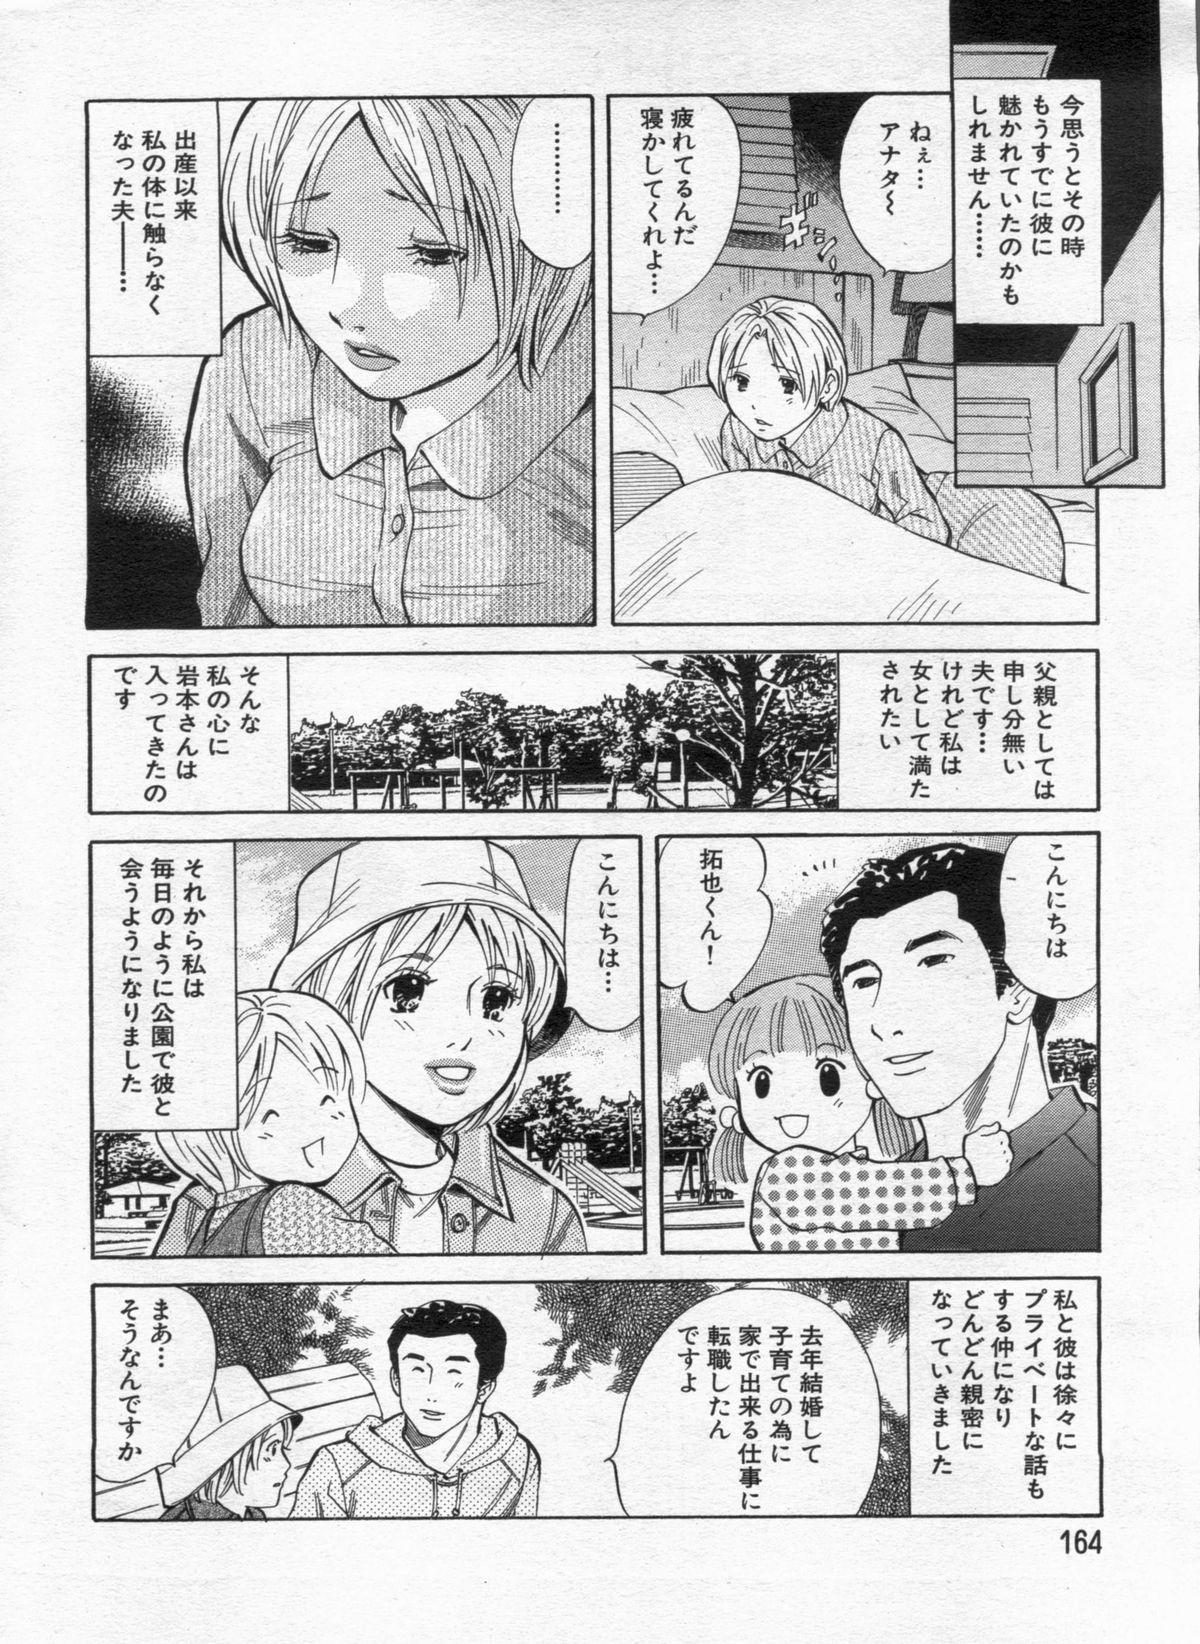 Manga Bon 2013-02 163